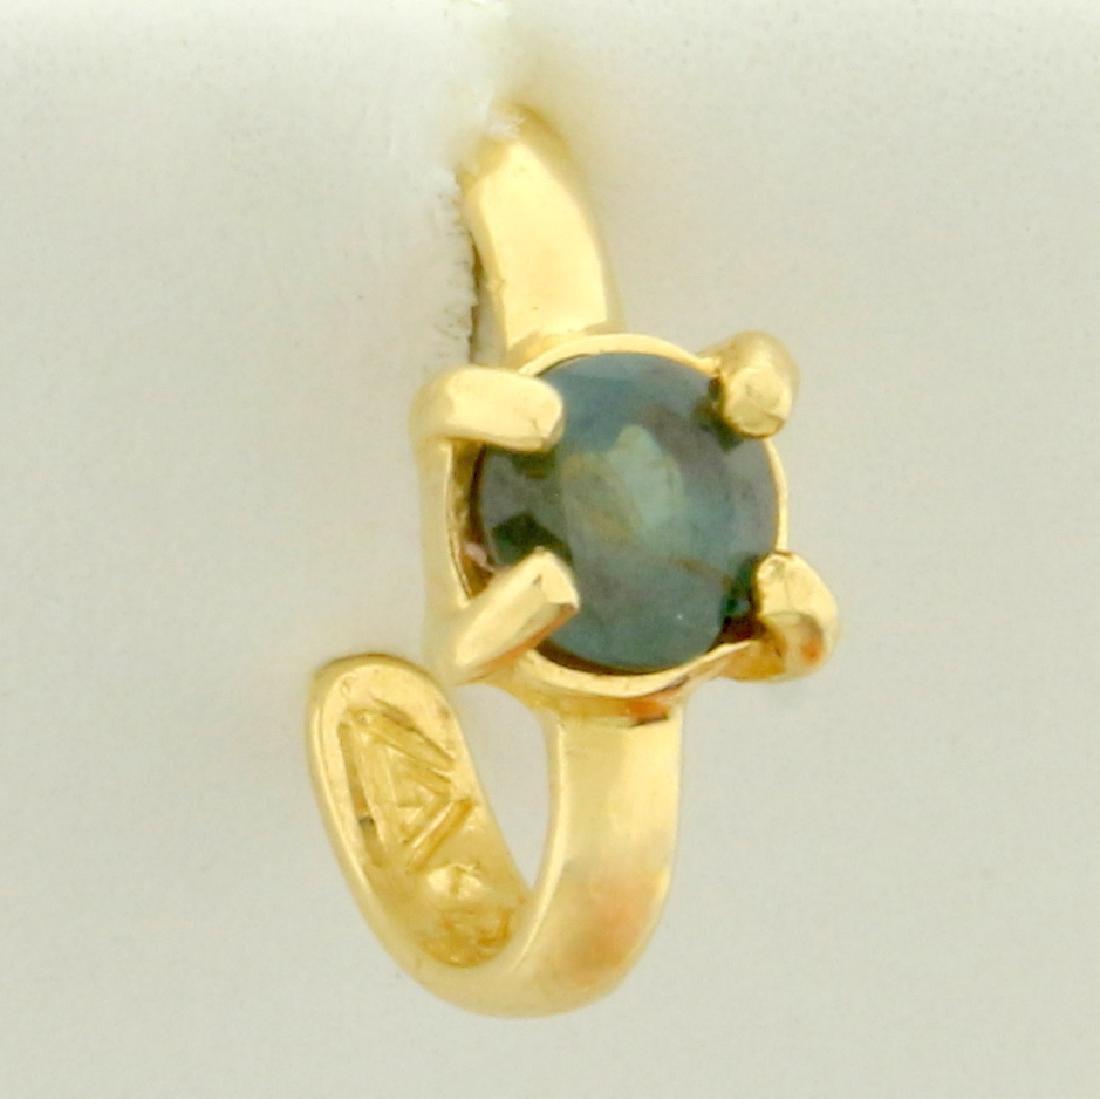 Alexandrite Ear Cuff in 14K Yellow Gold